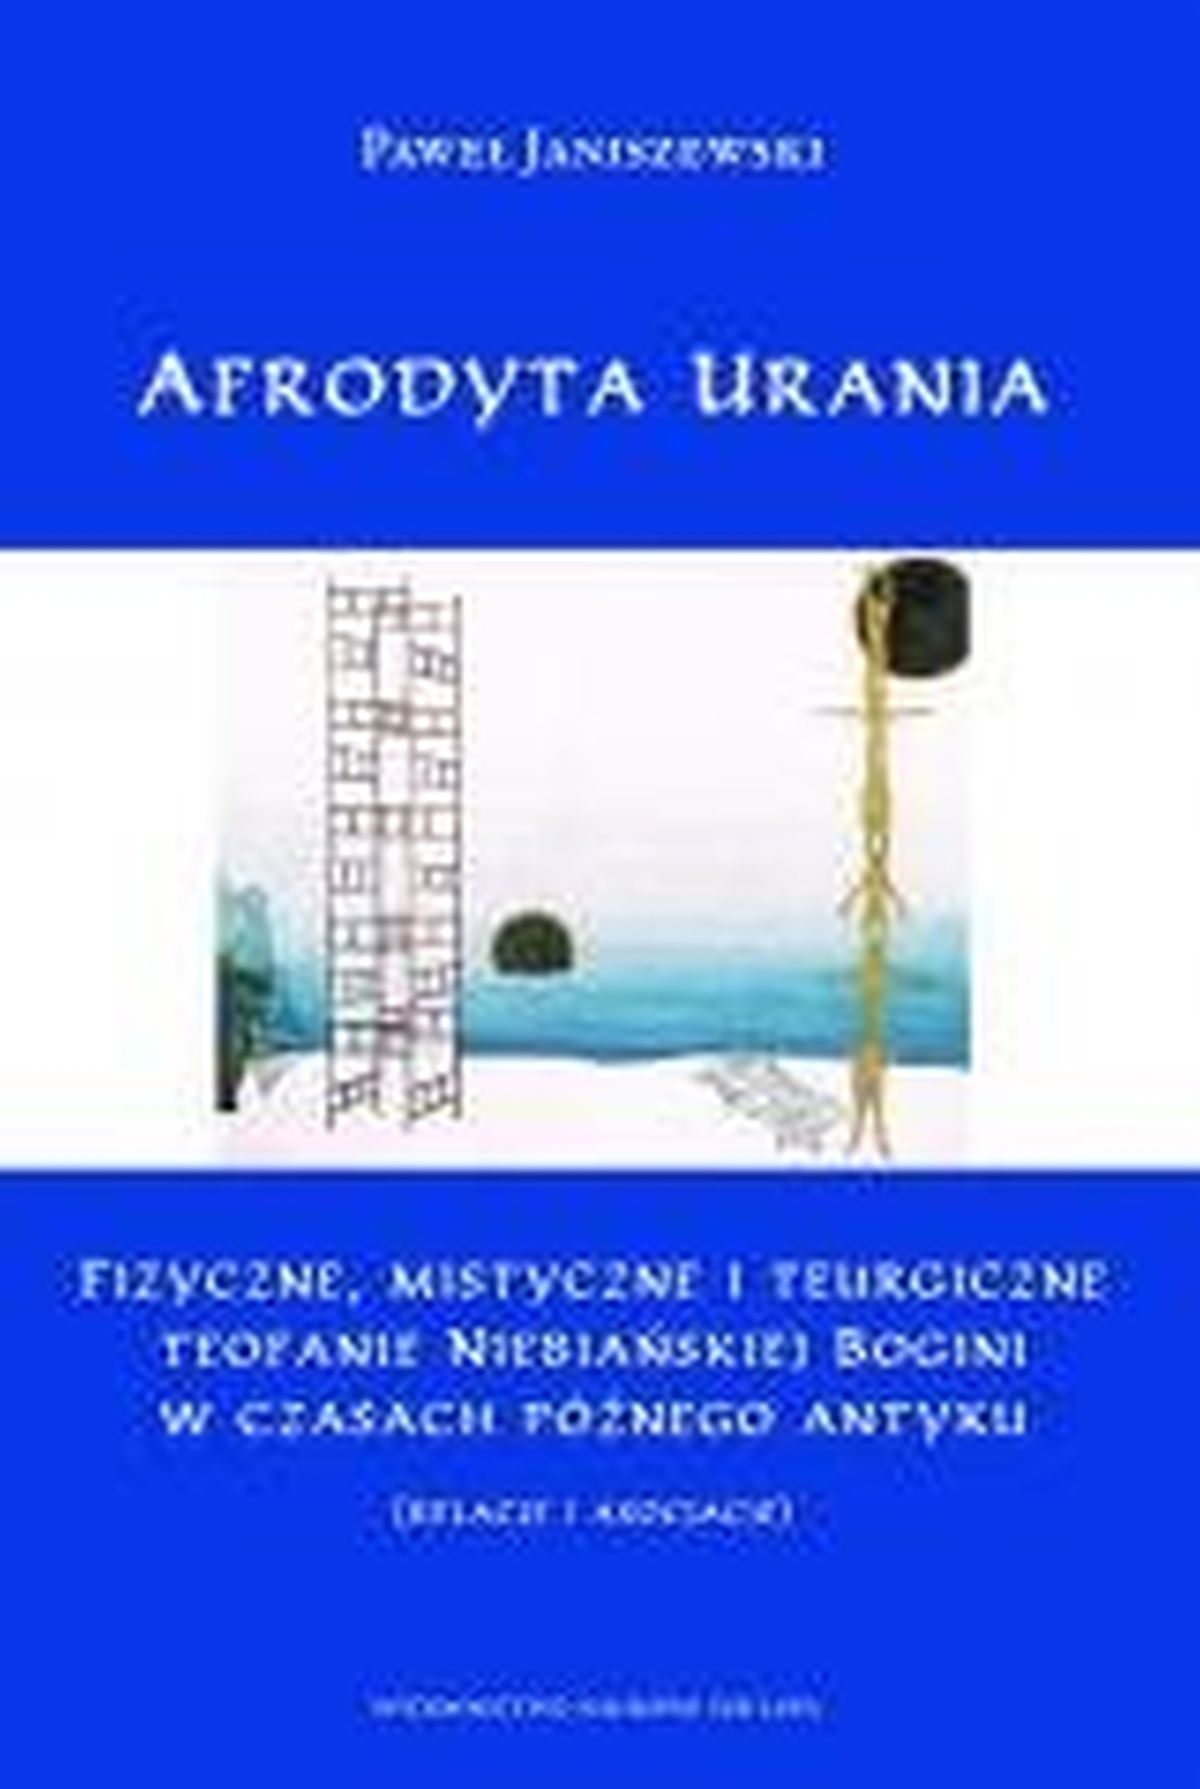 Afrodyta Urania